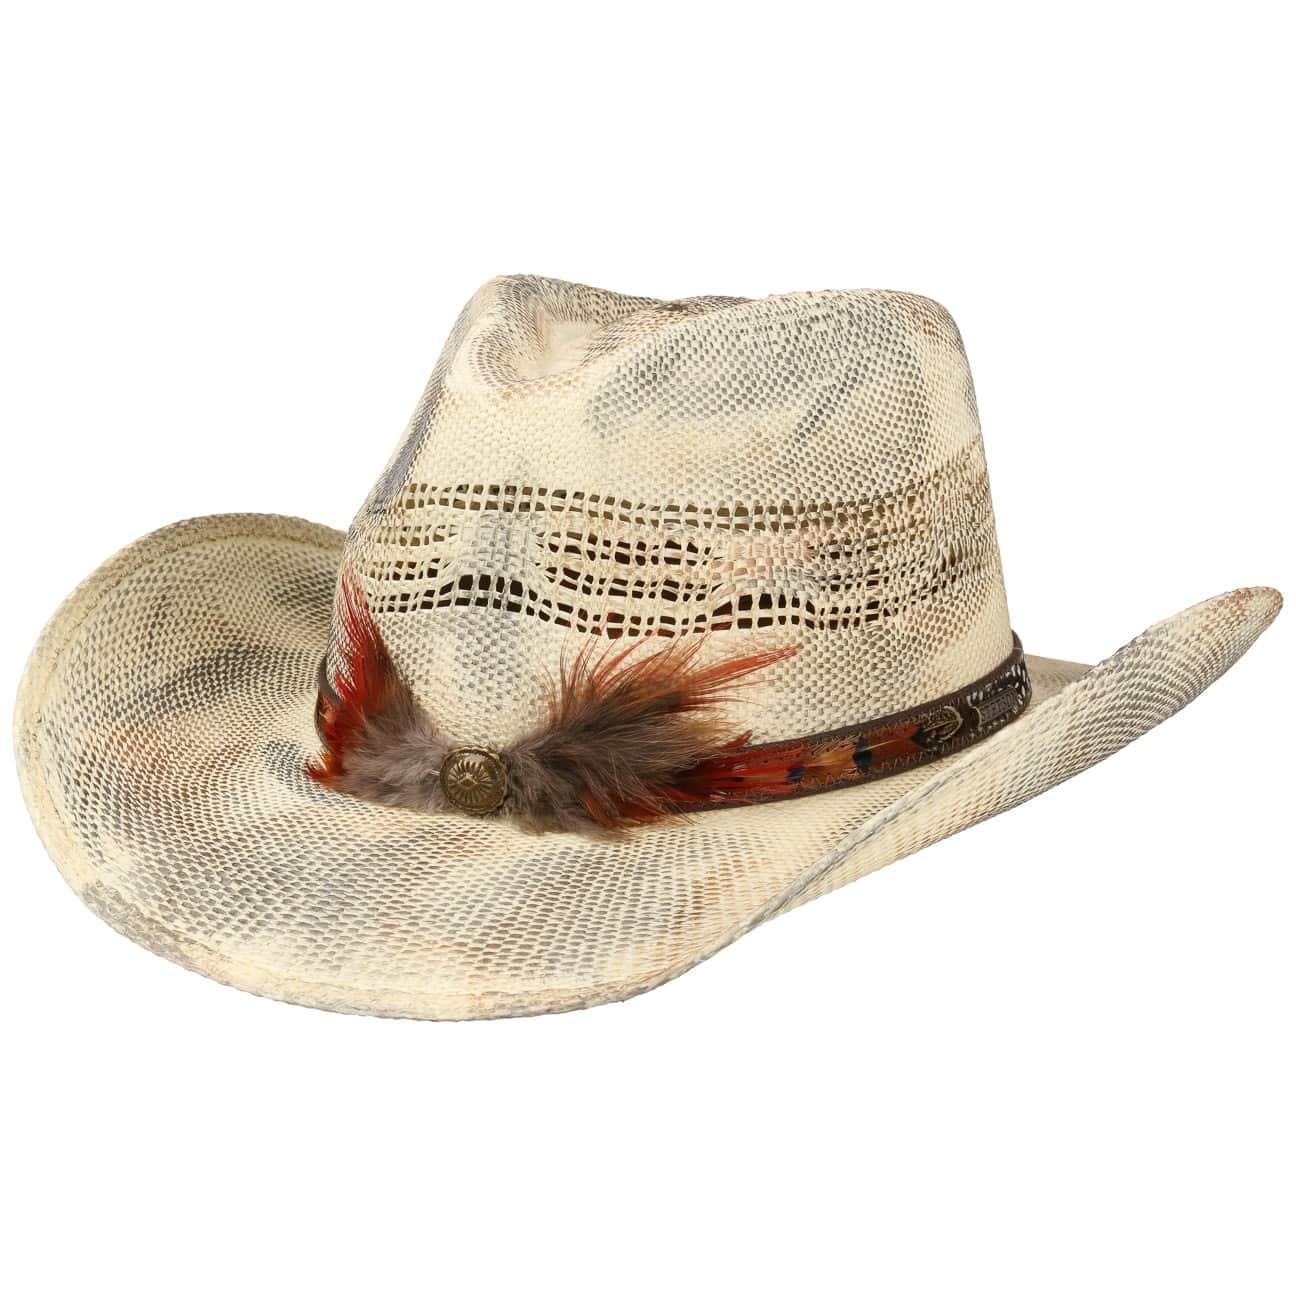 Smoky Toyo Western Hat by Stetson  sun hat